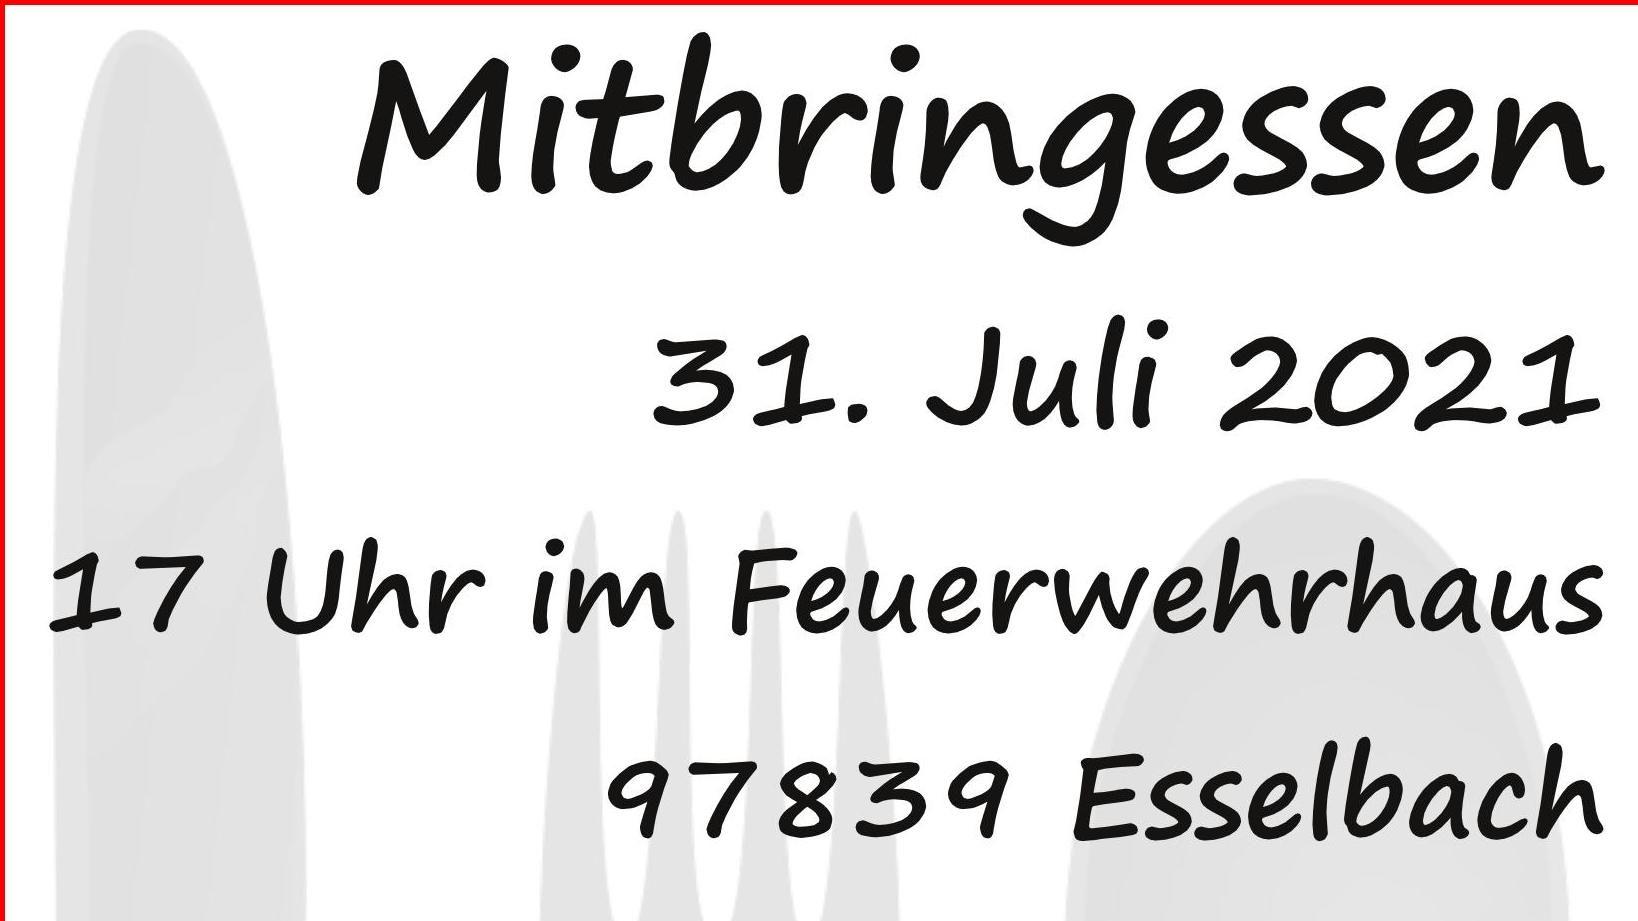 Mitbringsessen In 97839 Esselbach